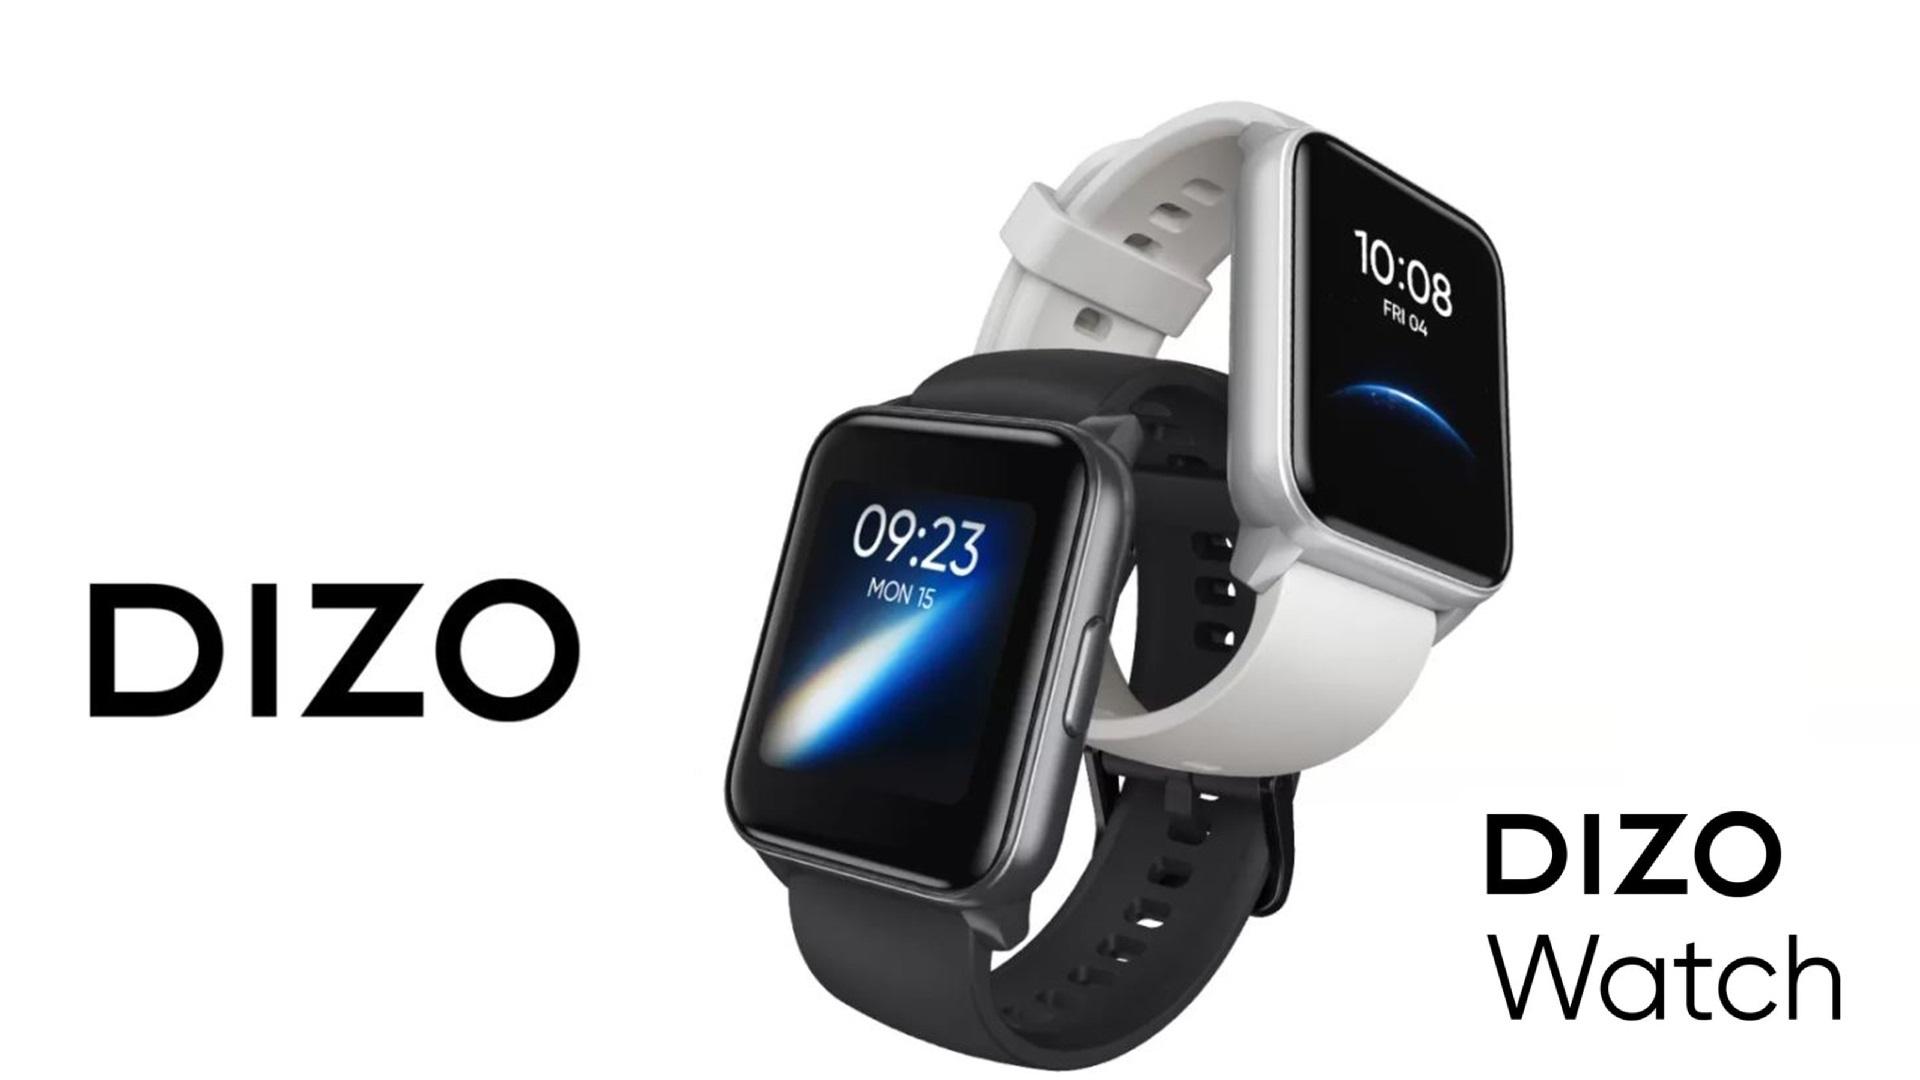 Realme Dizo Watch 2, Dizo Watch Pro Launch Date, Specifications, Price